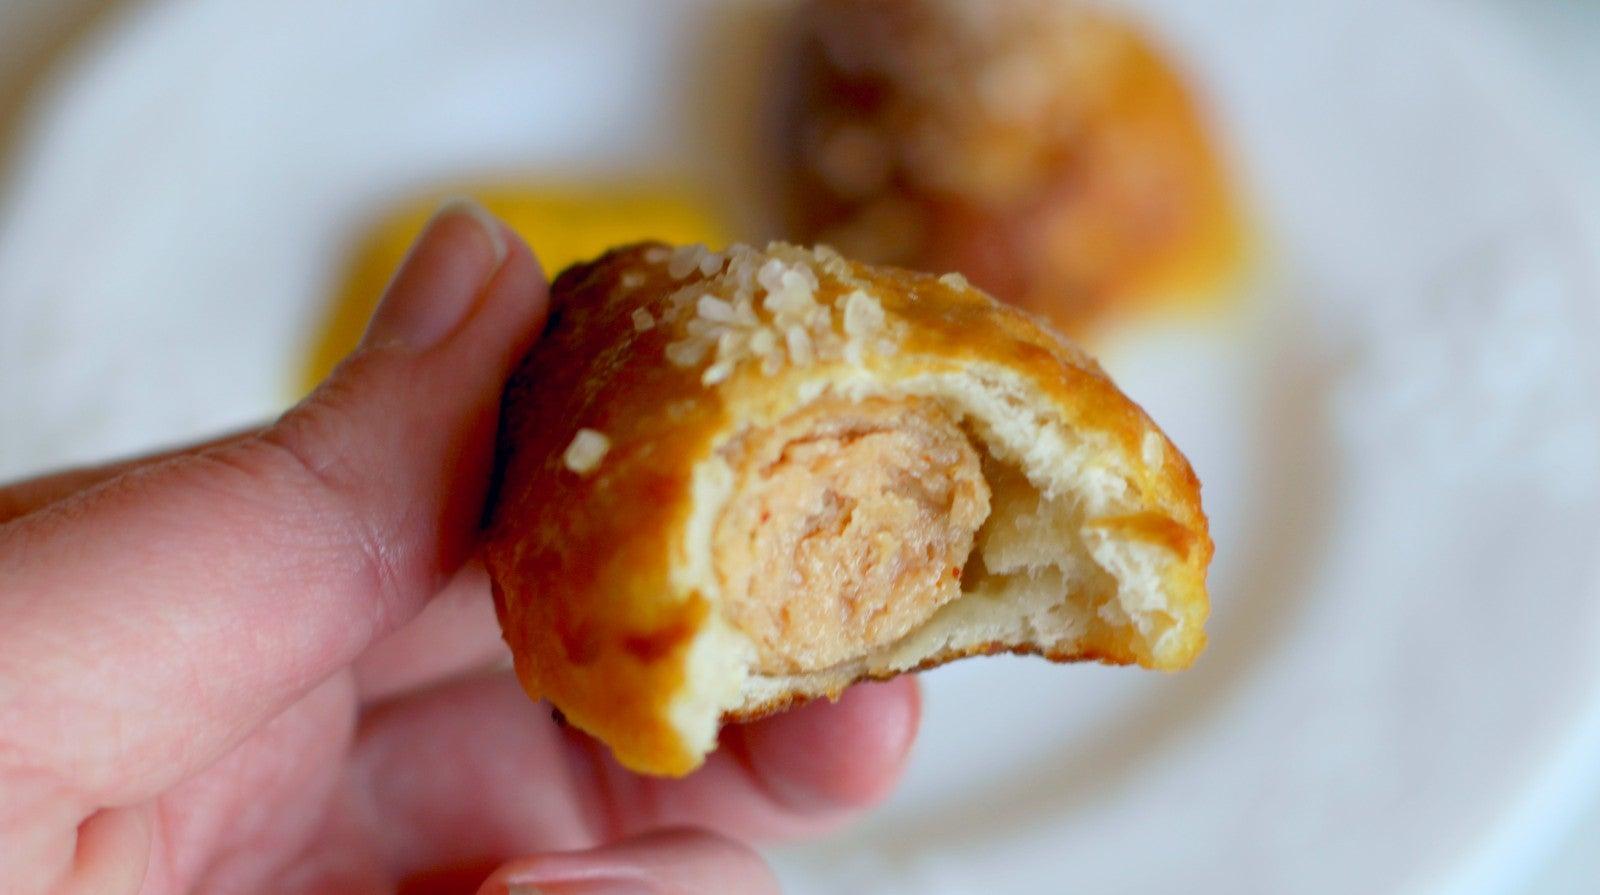 How To Make Stuffed Pretzel Bites With Pizza Dough